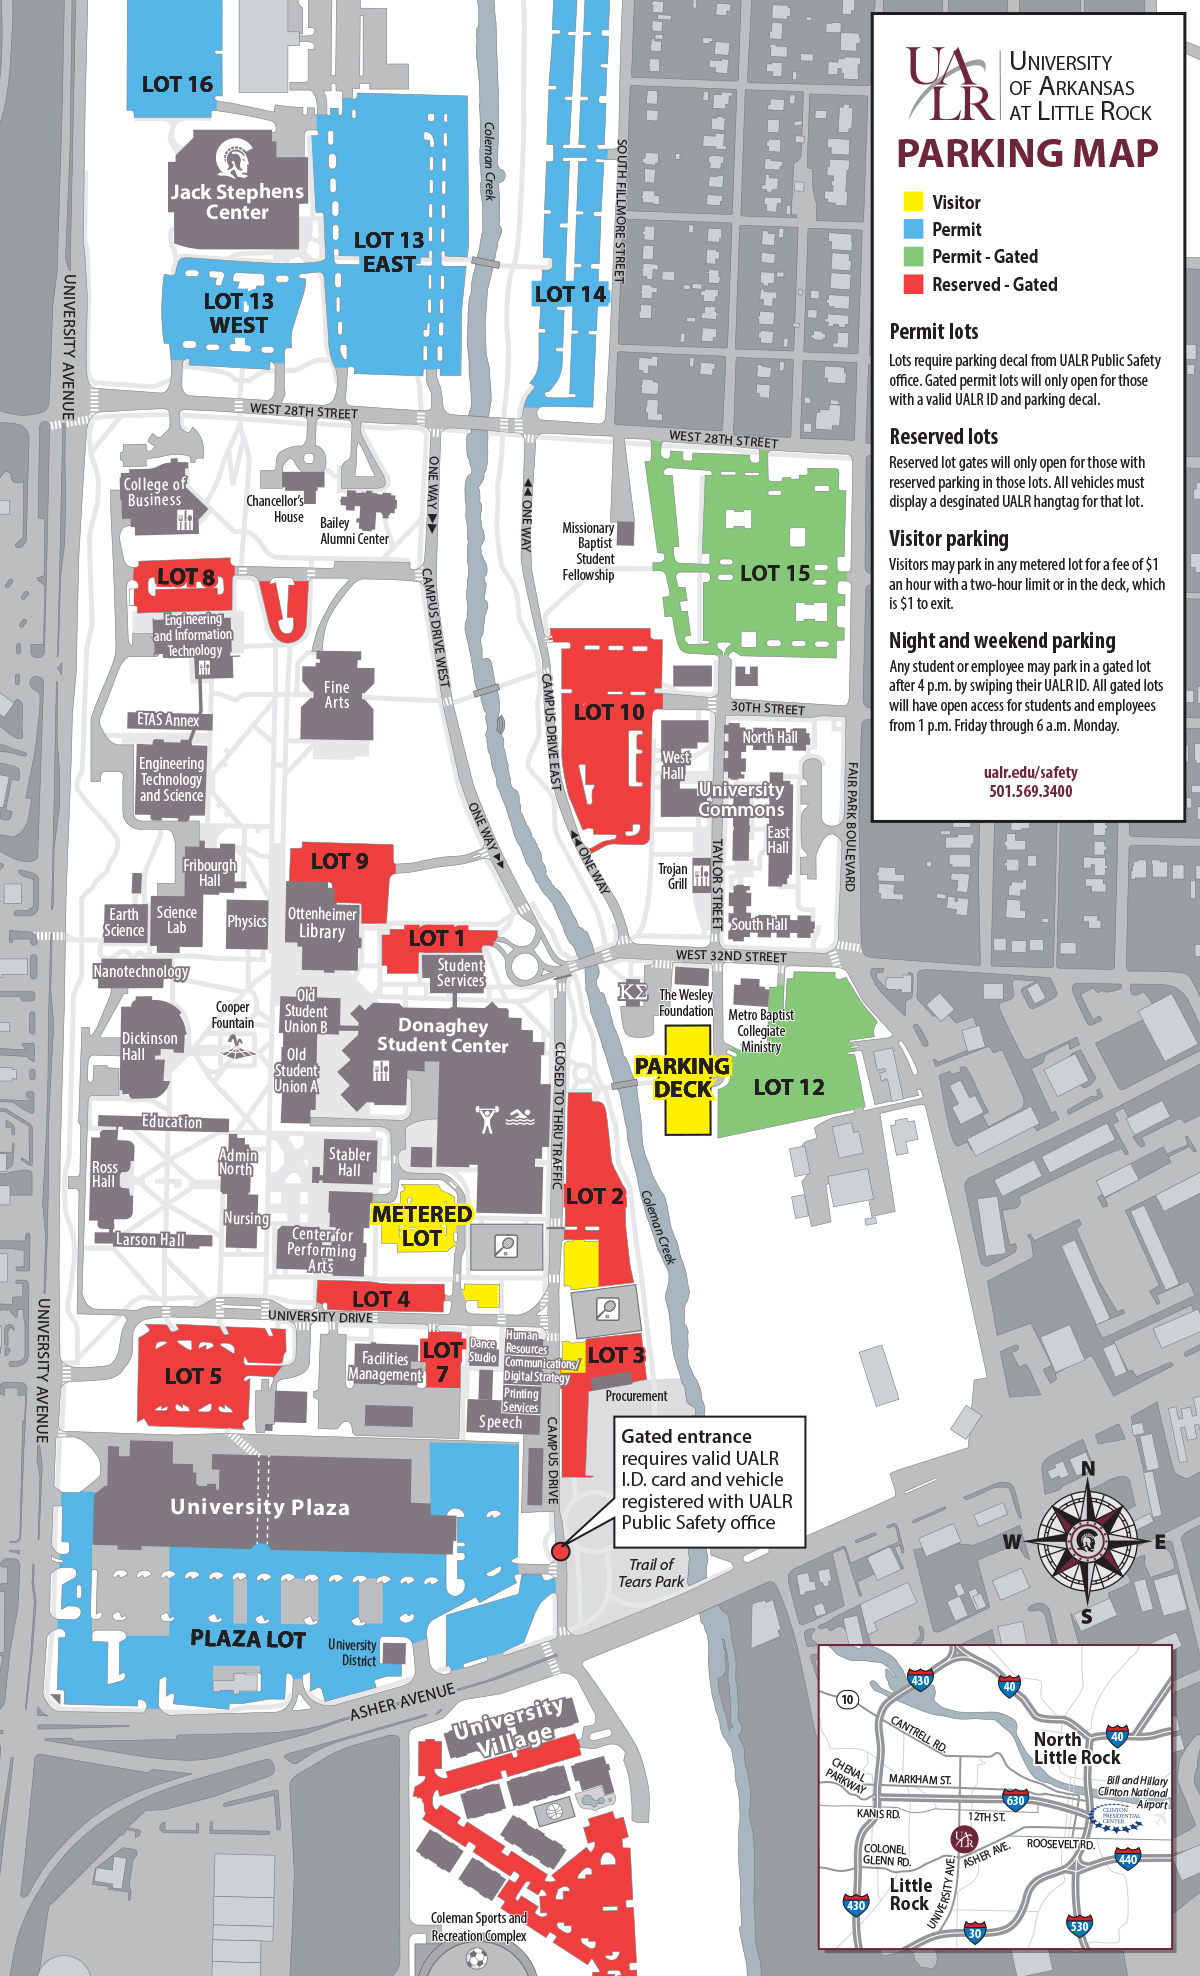 Missouri ST - Us open parking lot map